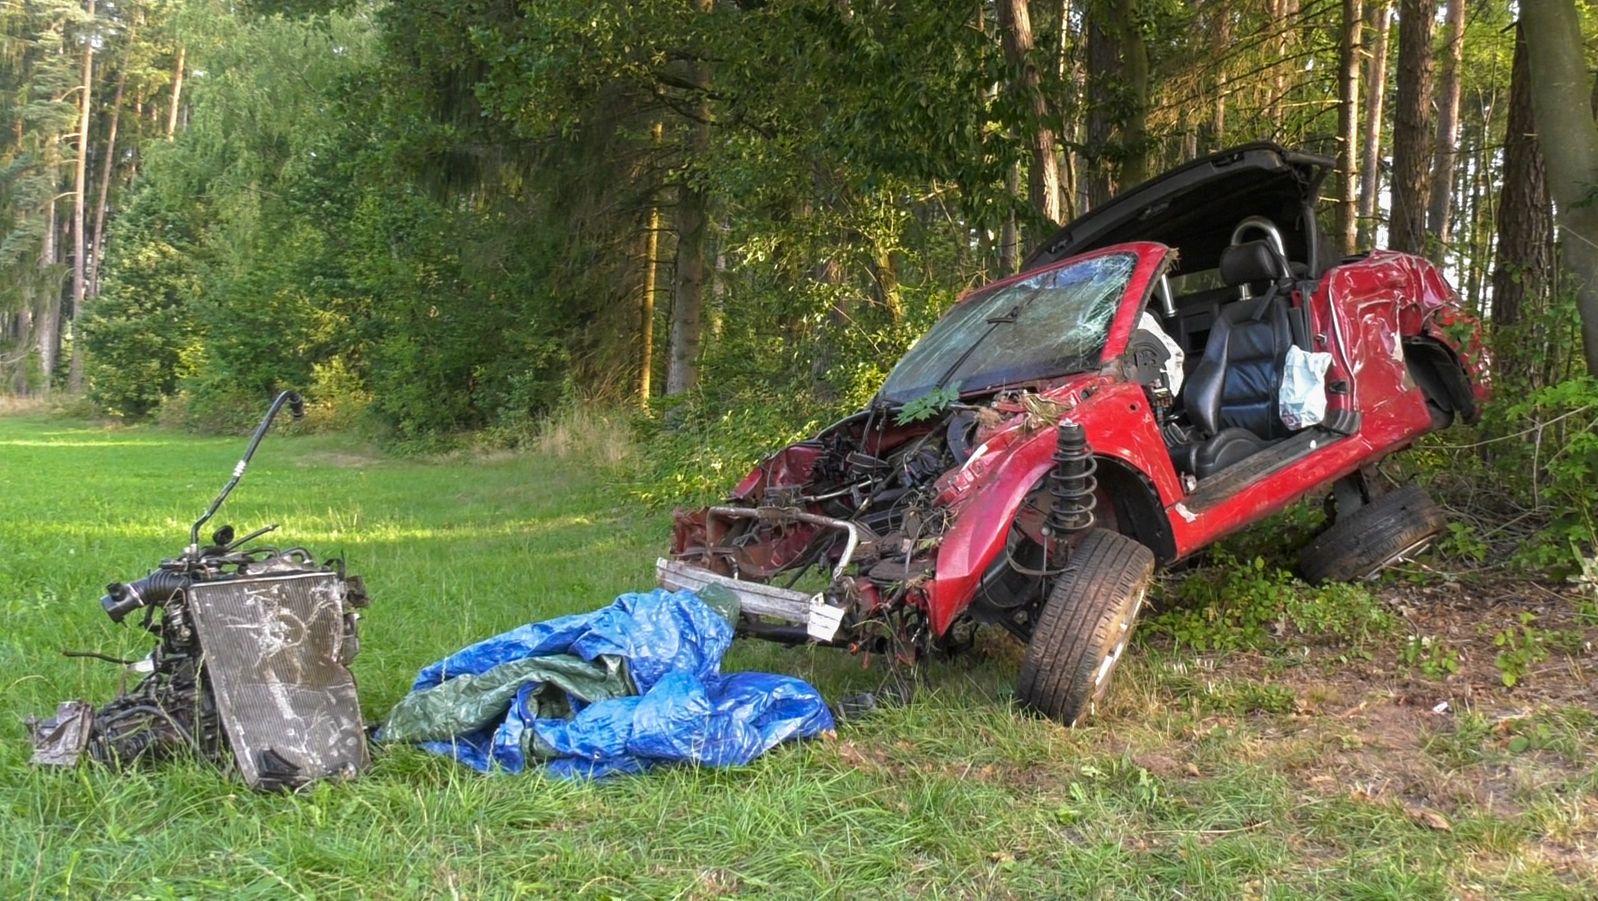 Das Autowrack nach dem Unfall